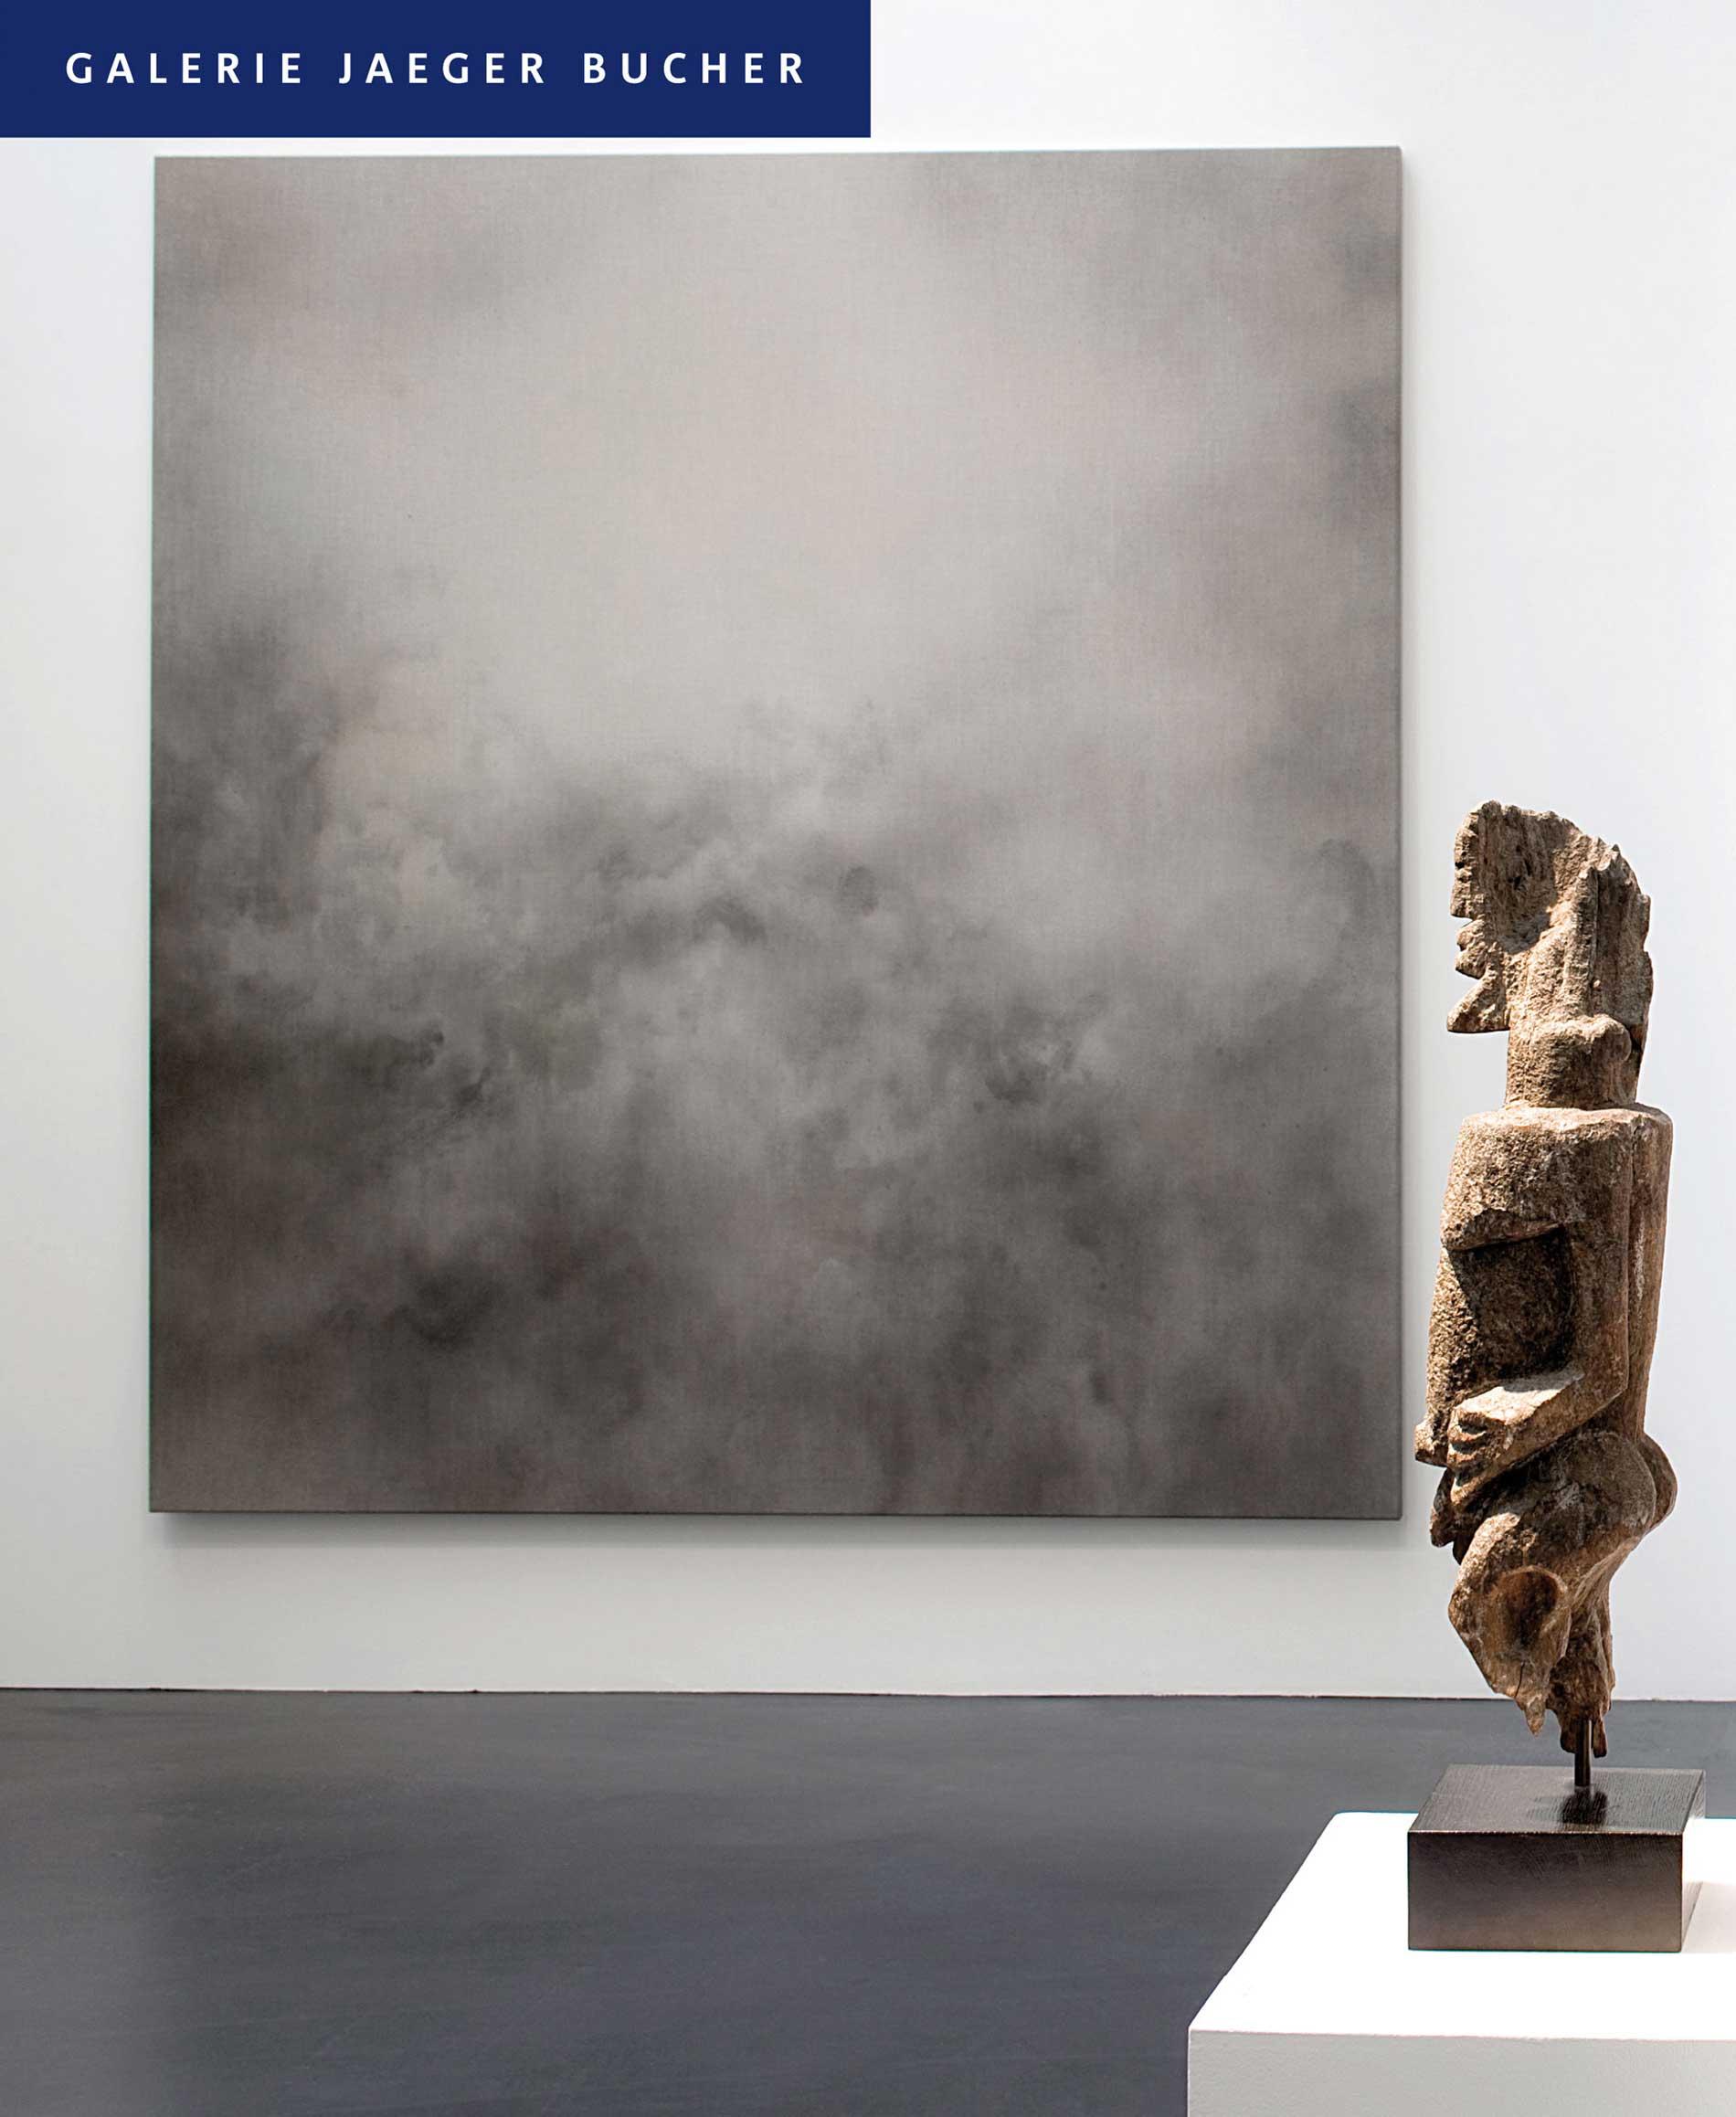 Editions Galerie Jaeger Bucher